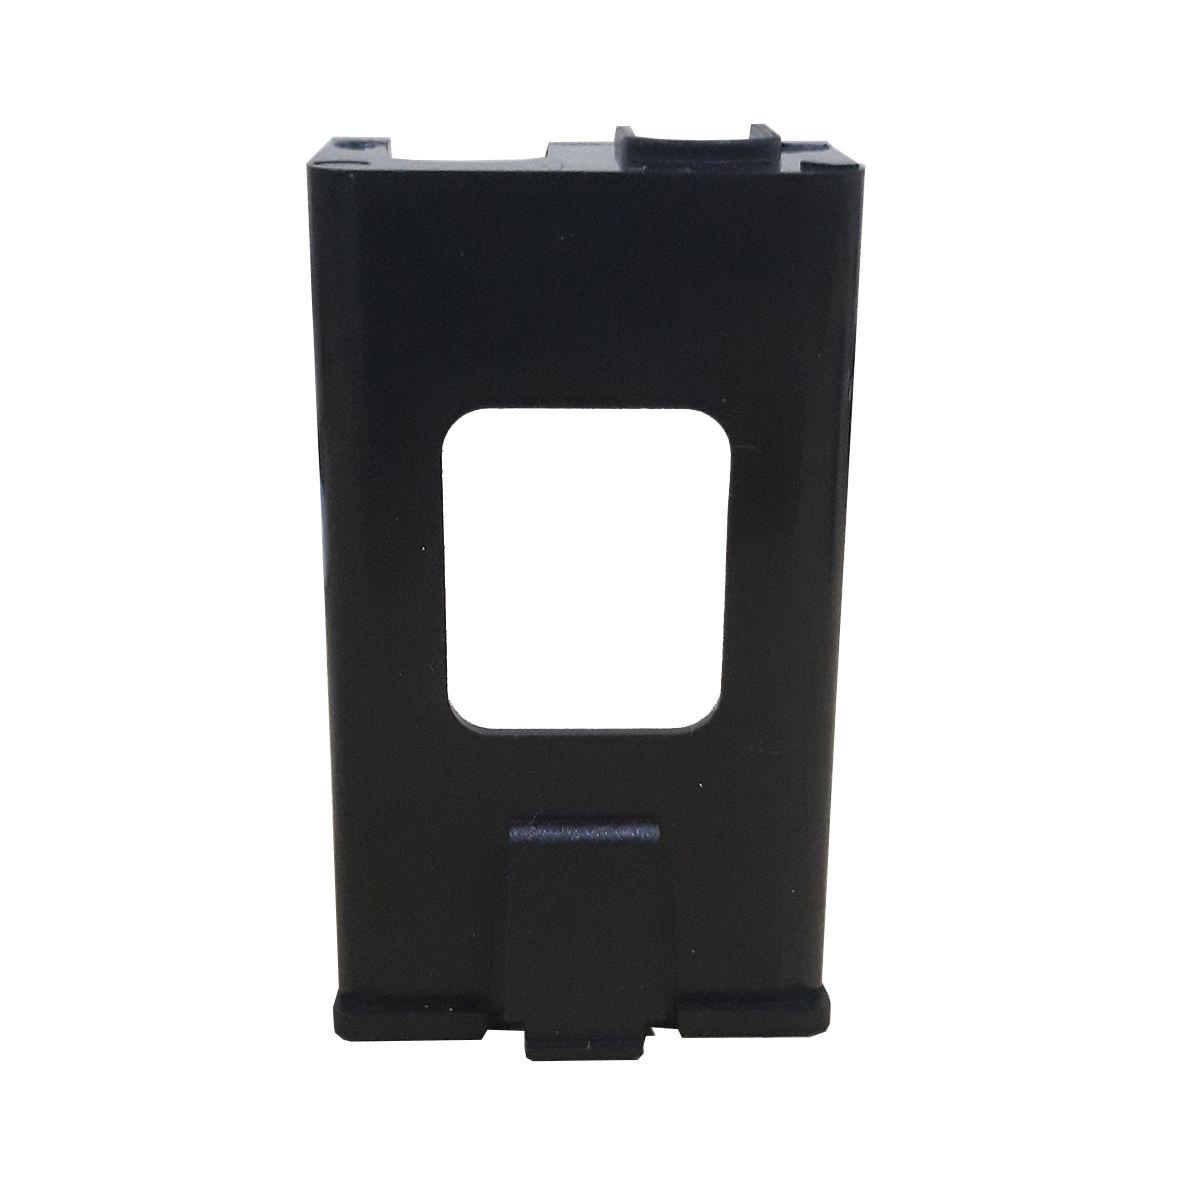 Gaveta Plástica Ronsani Model A para Bateria 9V Preto